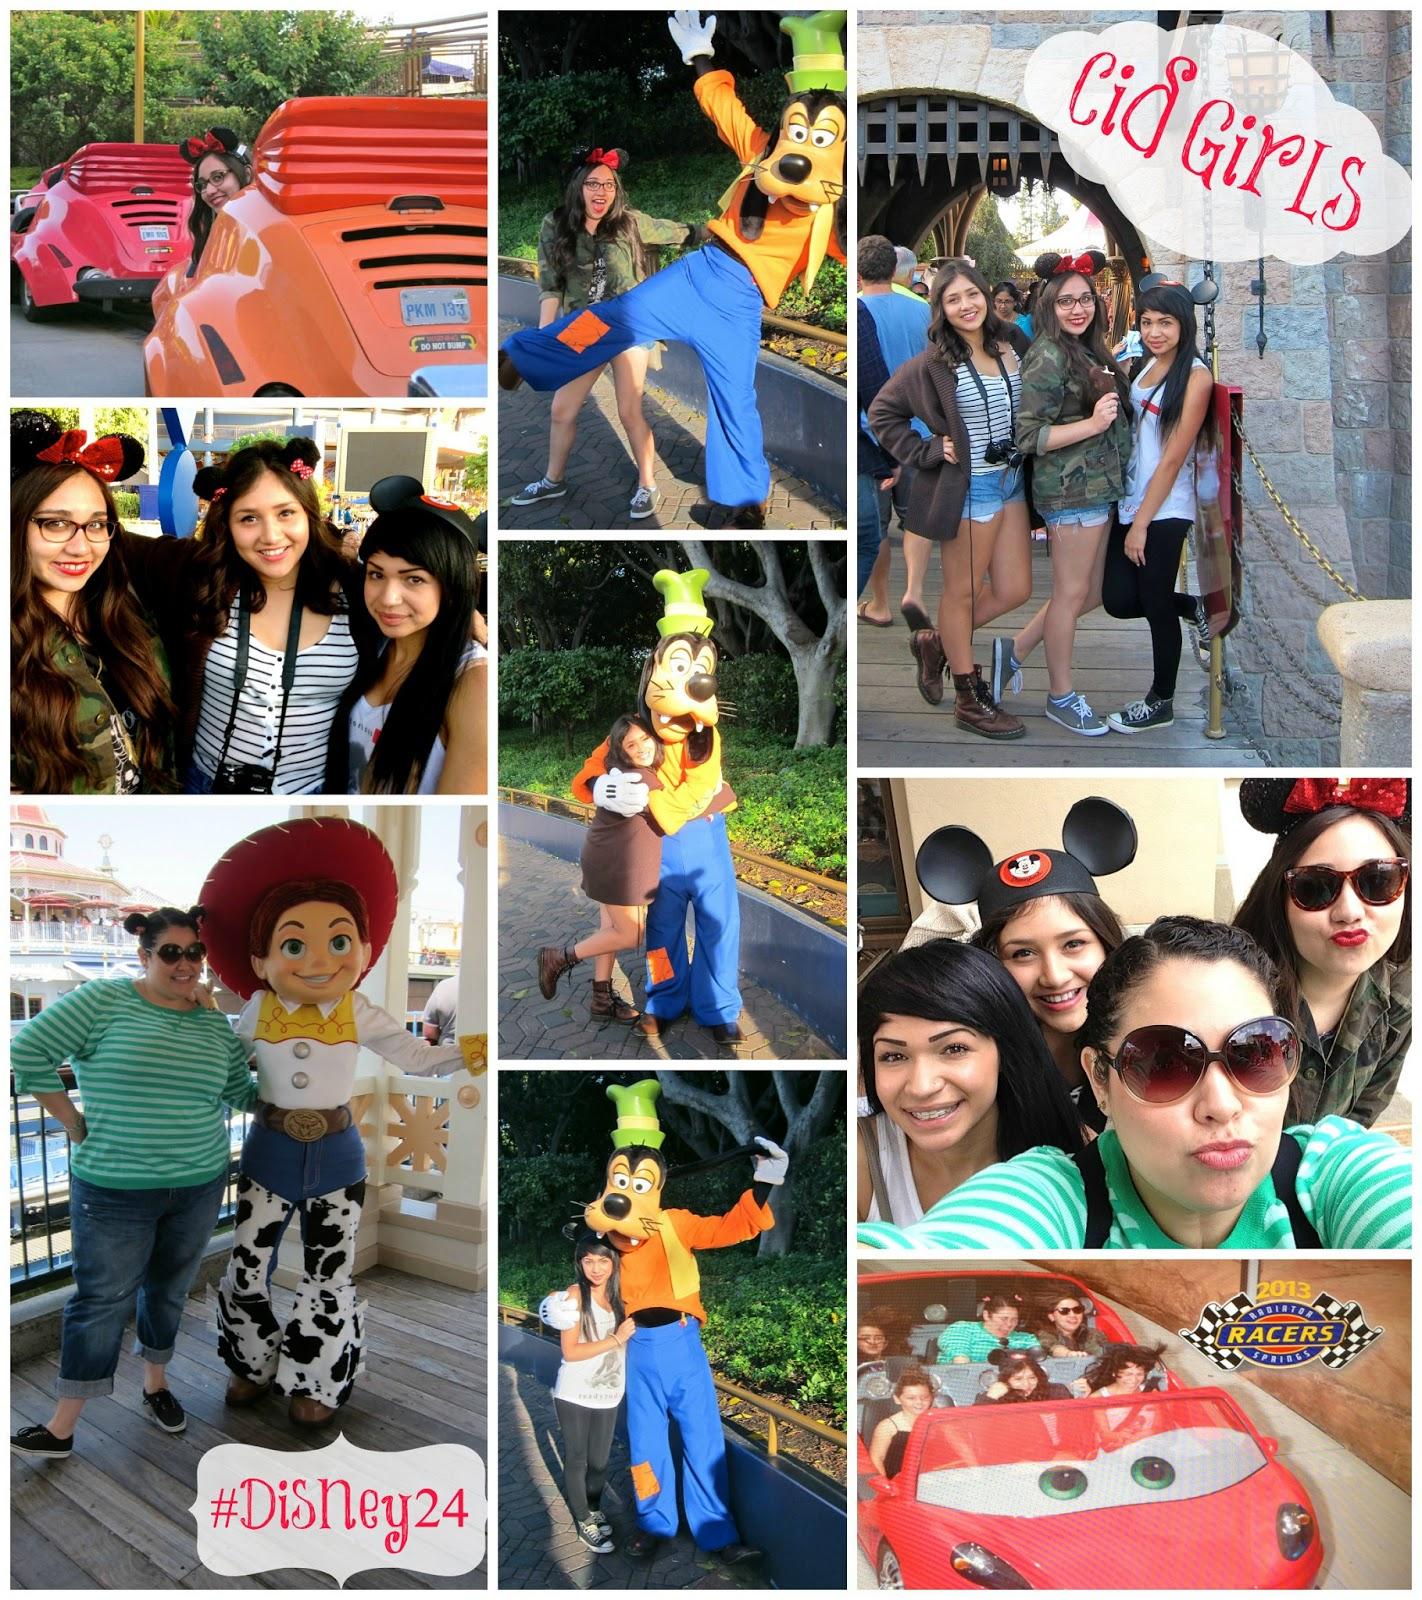 disneyland, monstrous summer, disney24, cid girls, jessie, goofy, mickey, california adventure, may 24, 2013,